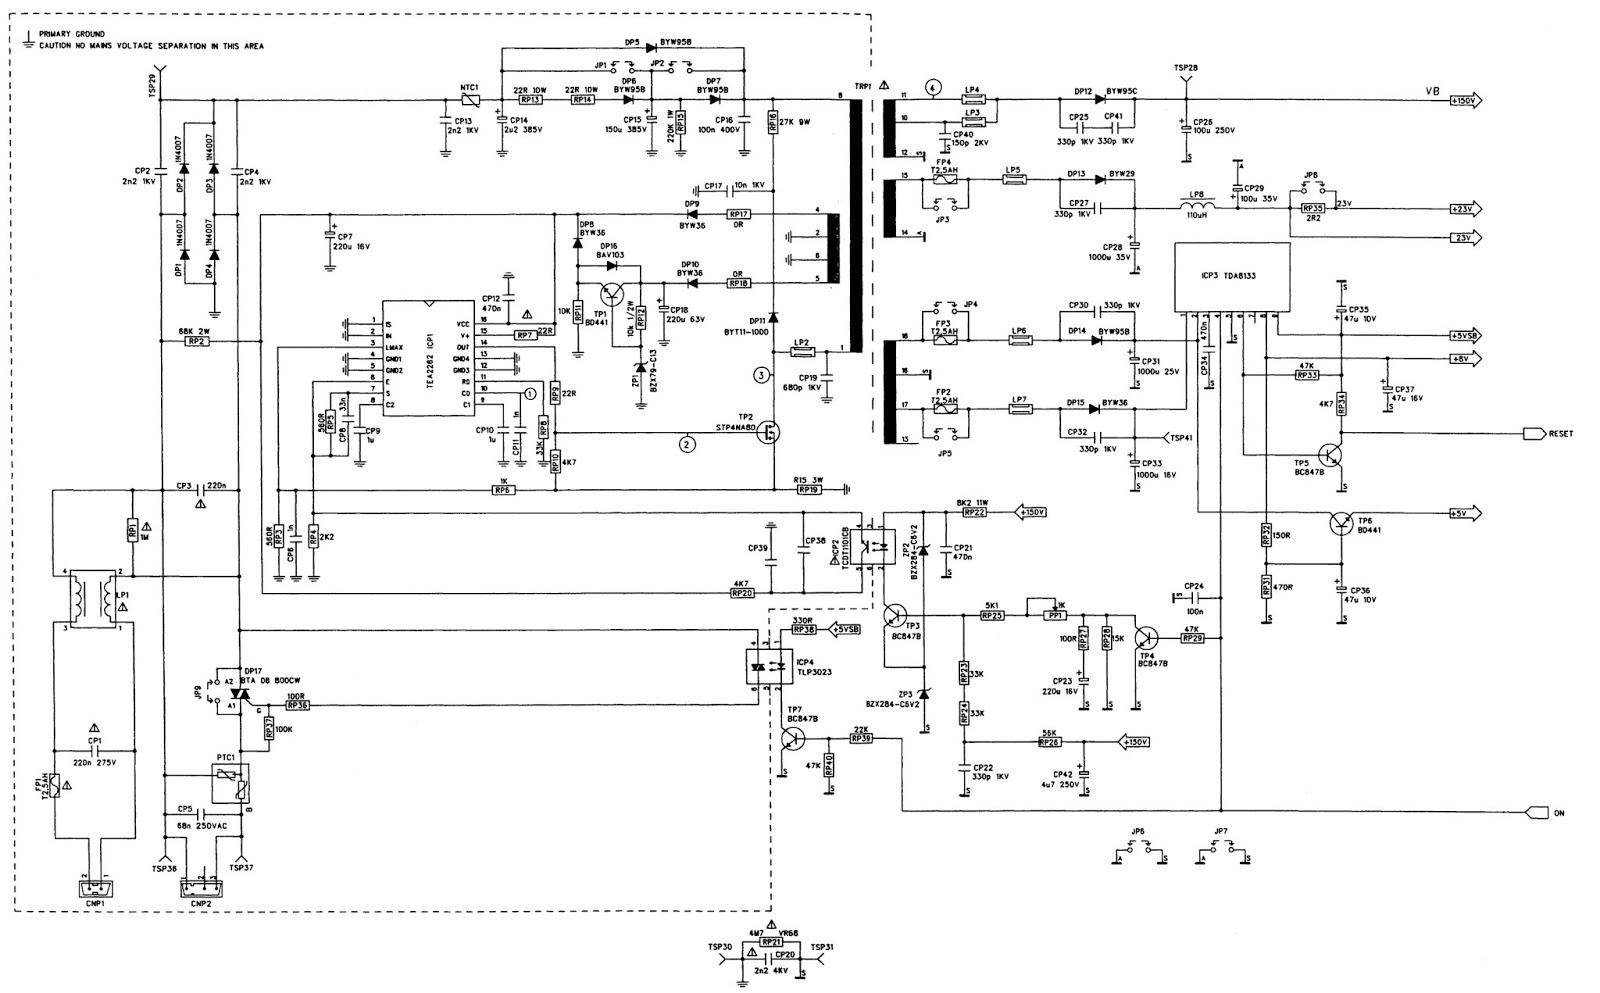 tatung connector diagram wiring diagramtatung connector diagram best wiring librarytatung t25n440 t32w440 service adjustments main power [smps man network